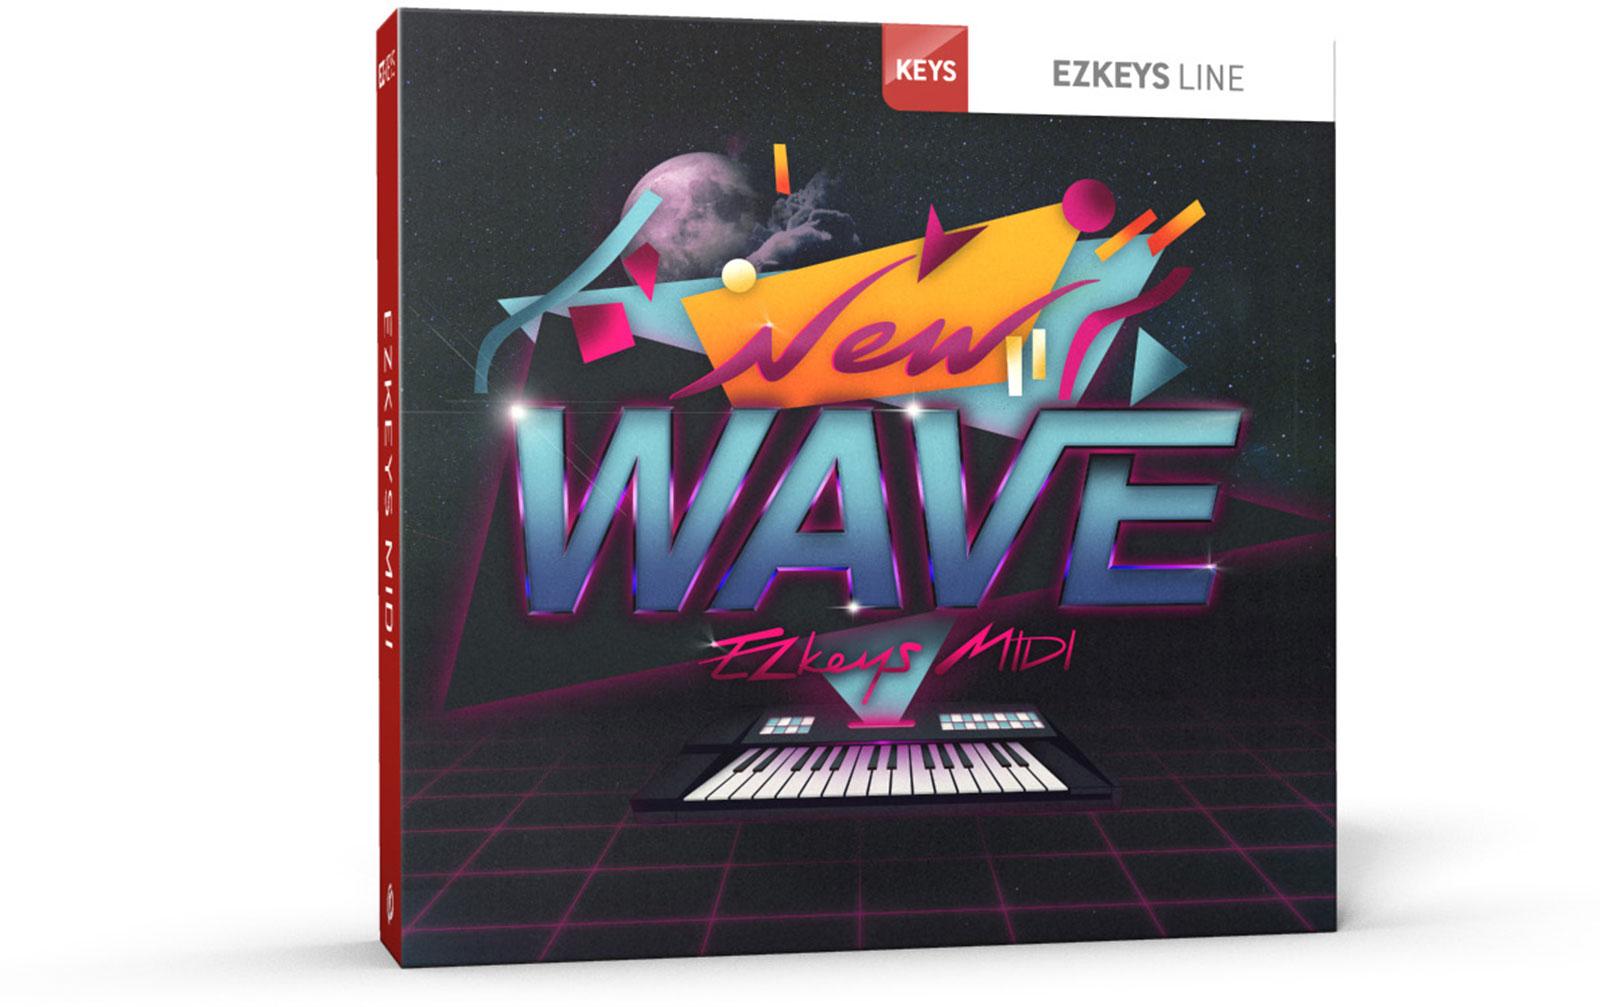 toontrack-ezkeys-new-wave-midi-pack-download-